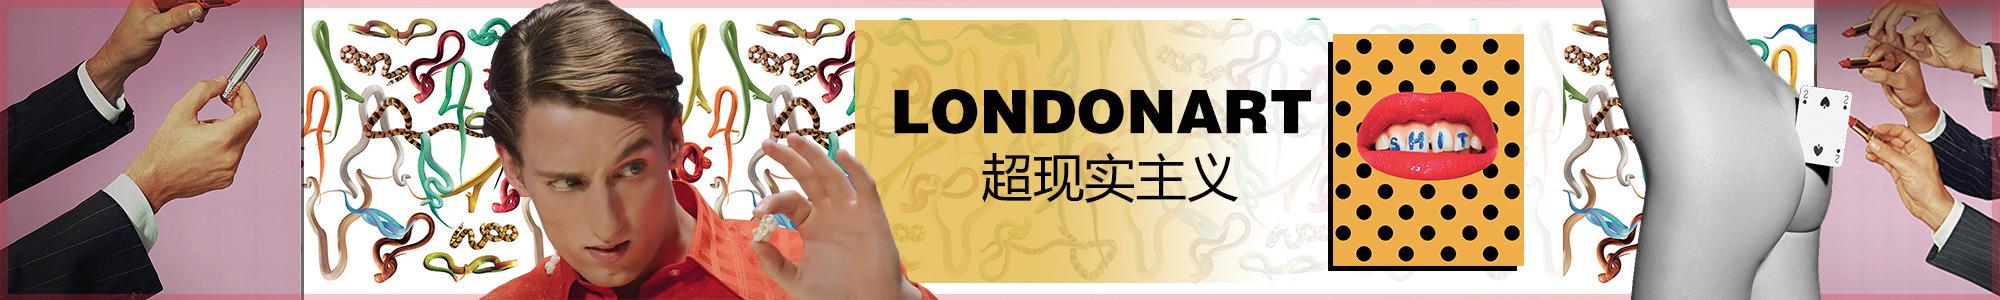 Londonart 超现实主义